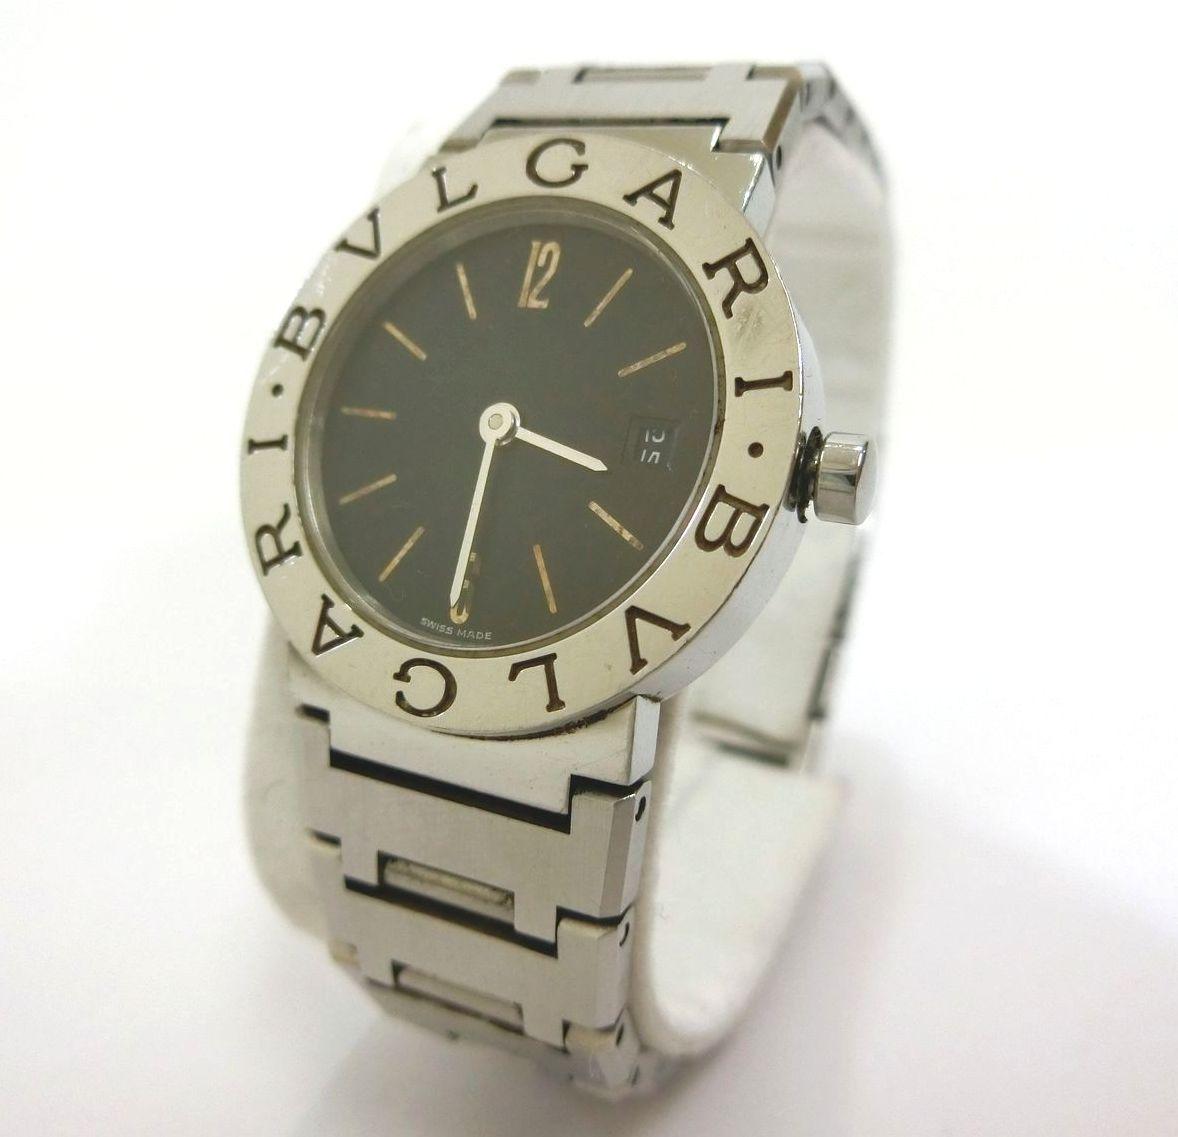 BVLGARI・ブルガリ ブルガリ クォーツ腕時計 BB 26 SS レディース メタルベルト 黒文字盤 廃盤 特価品 中古 19-4098